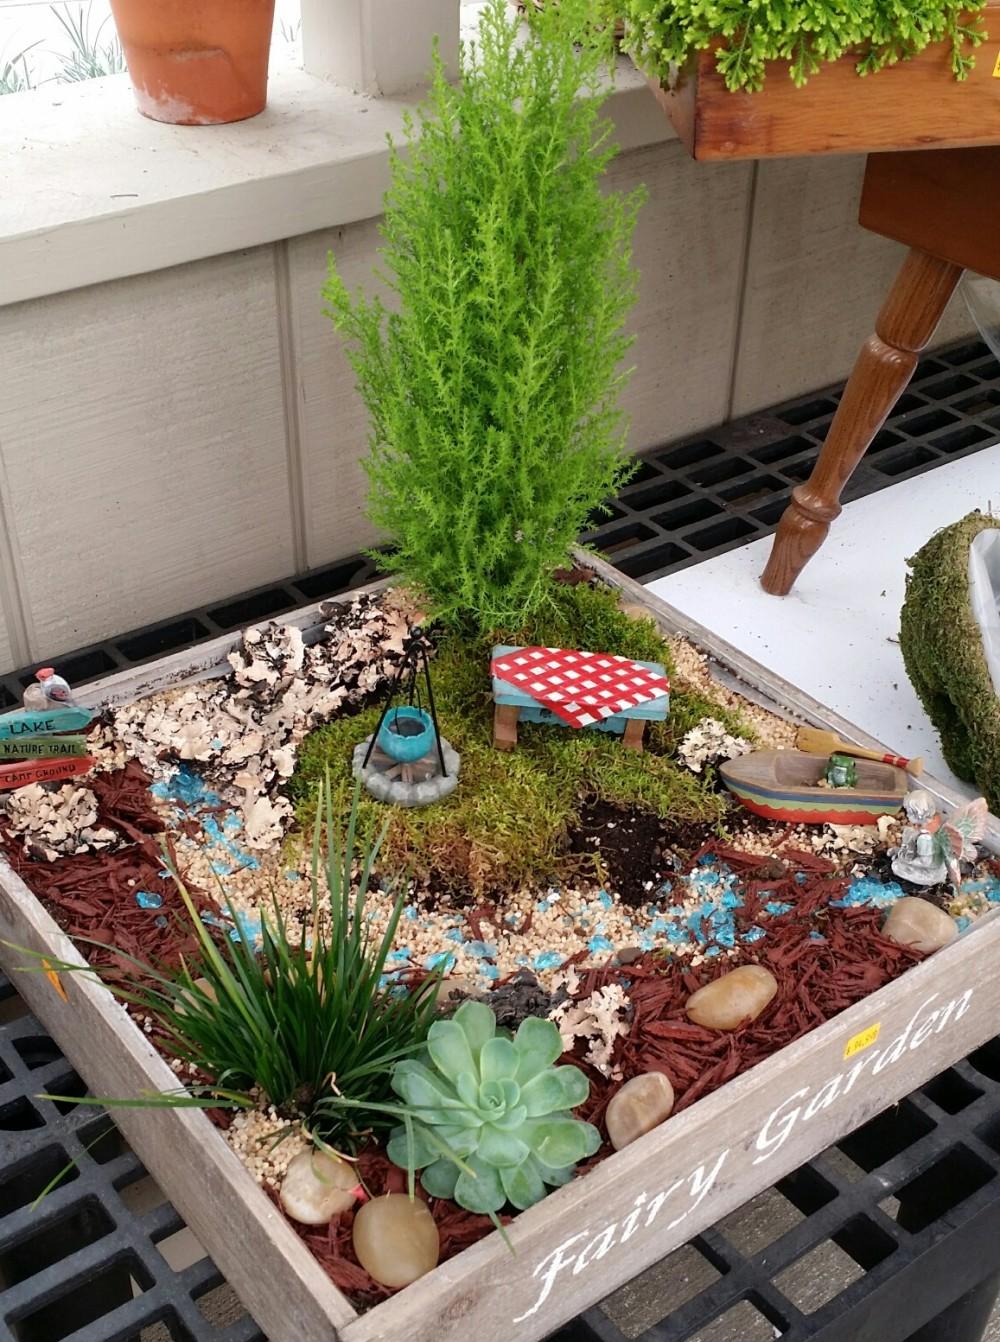 Garden Projects For Kids: Miniature Fairy Garden Ideas DIY